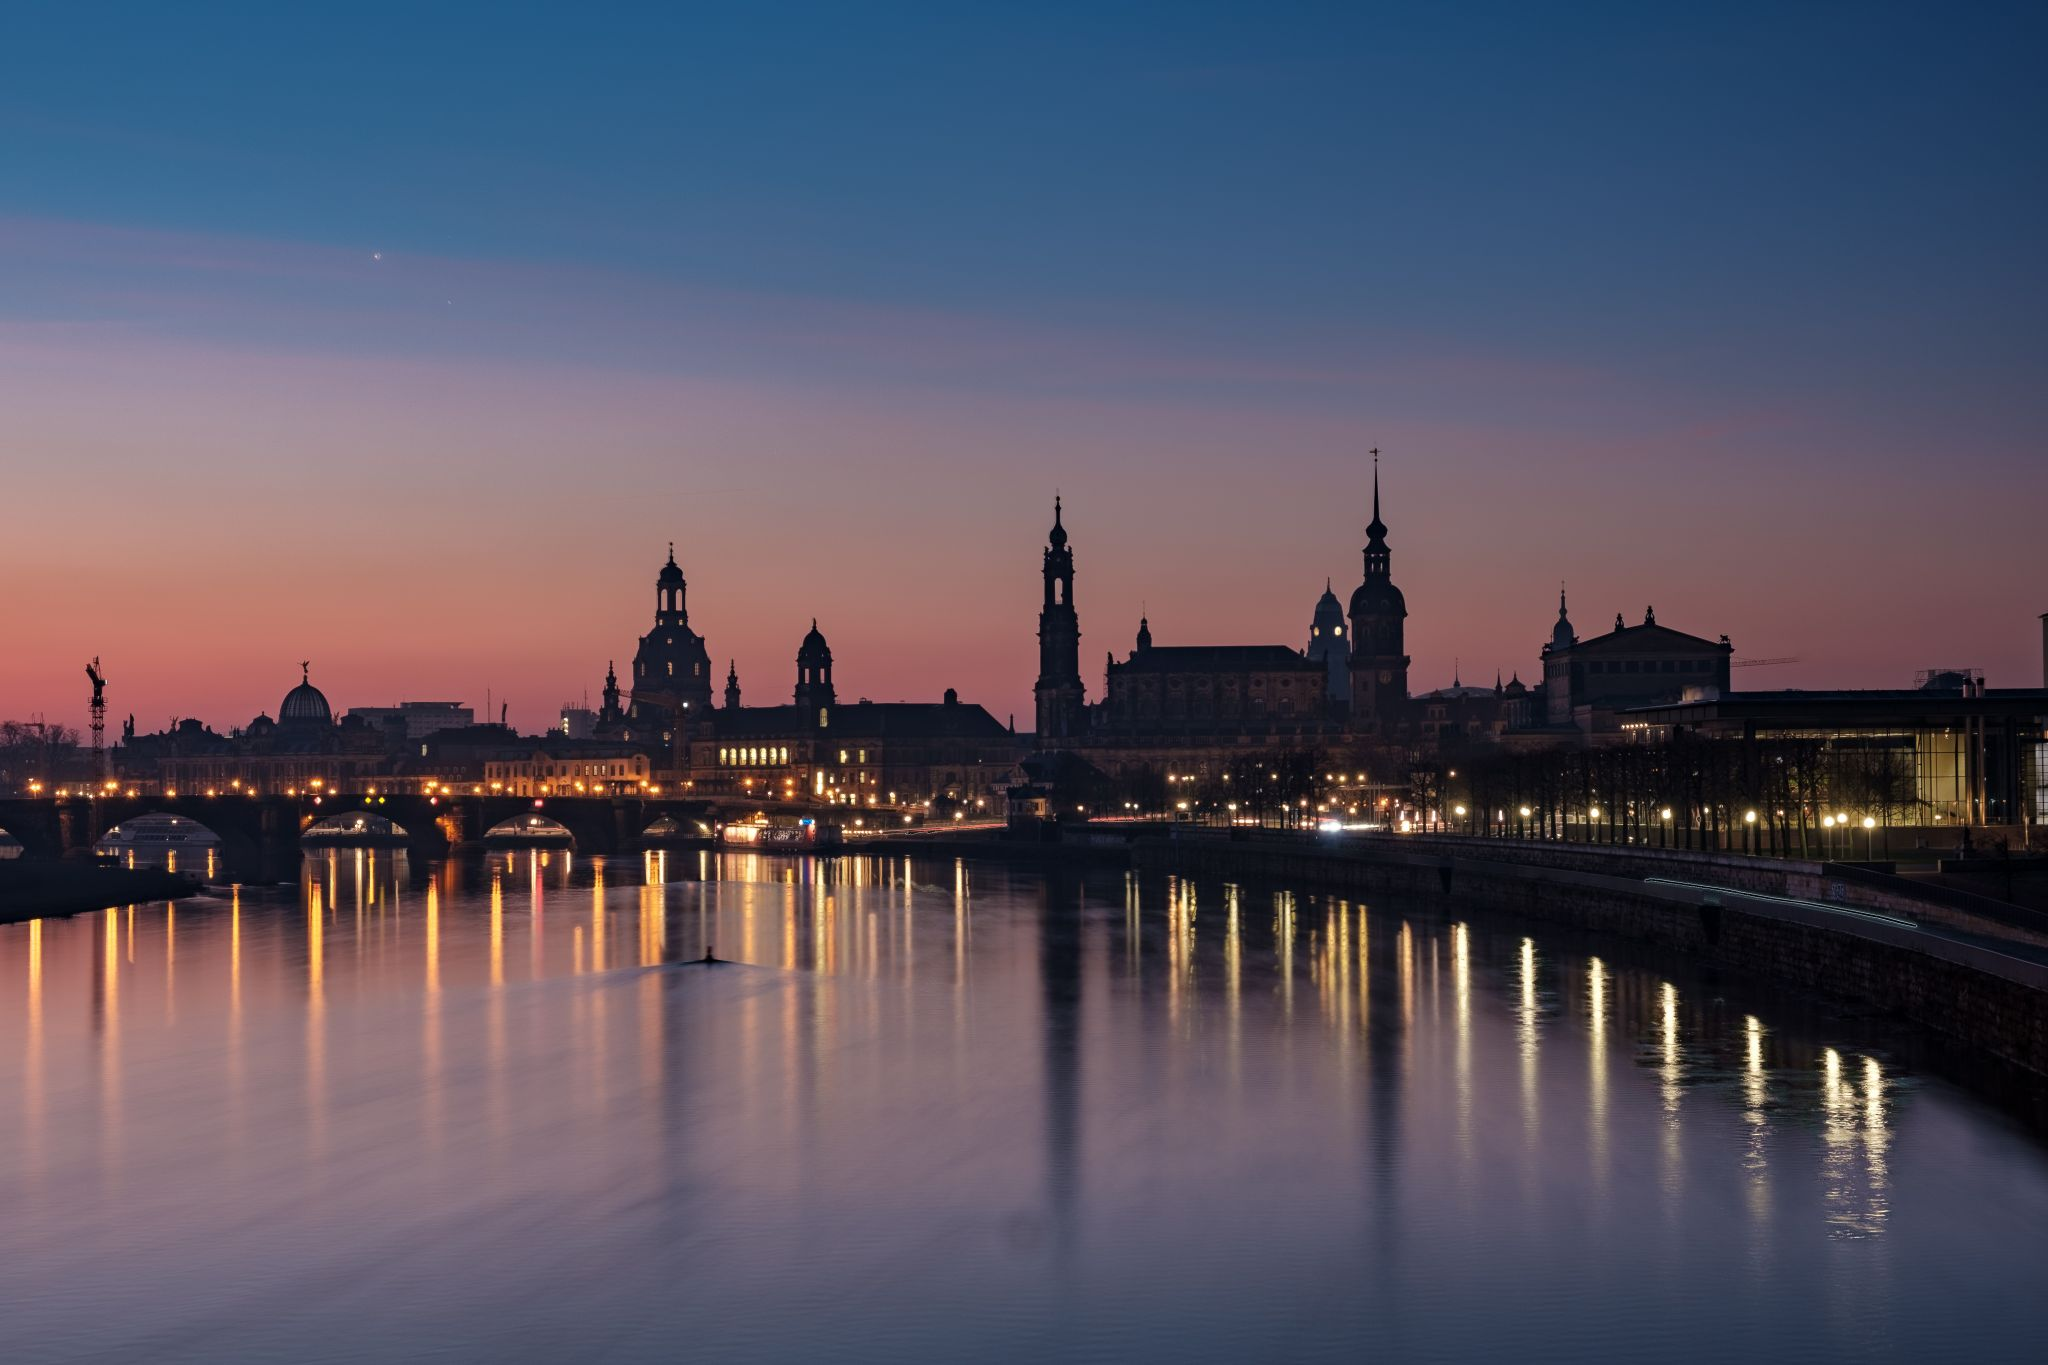 Dresden Marienbrücke, Germany